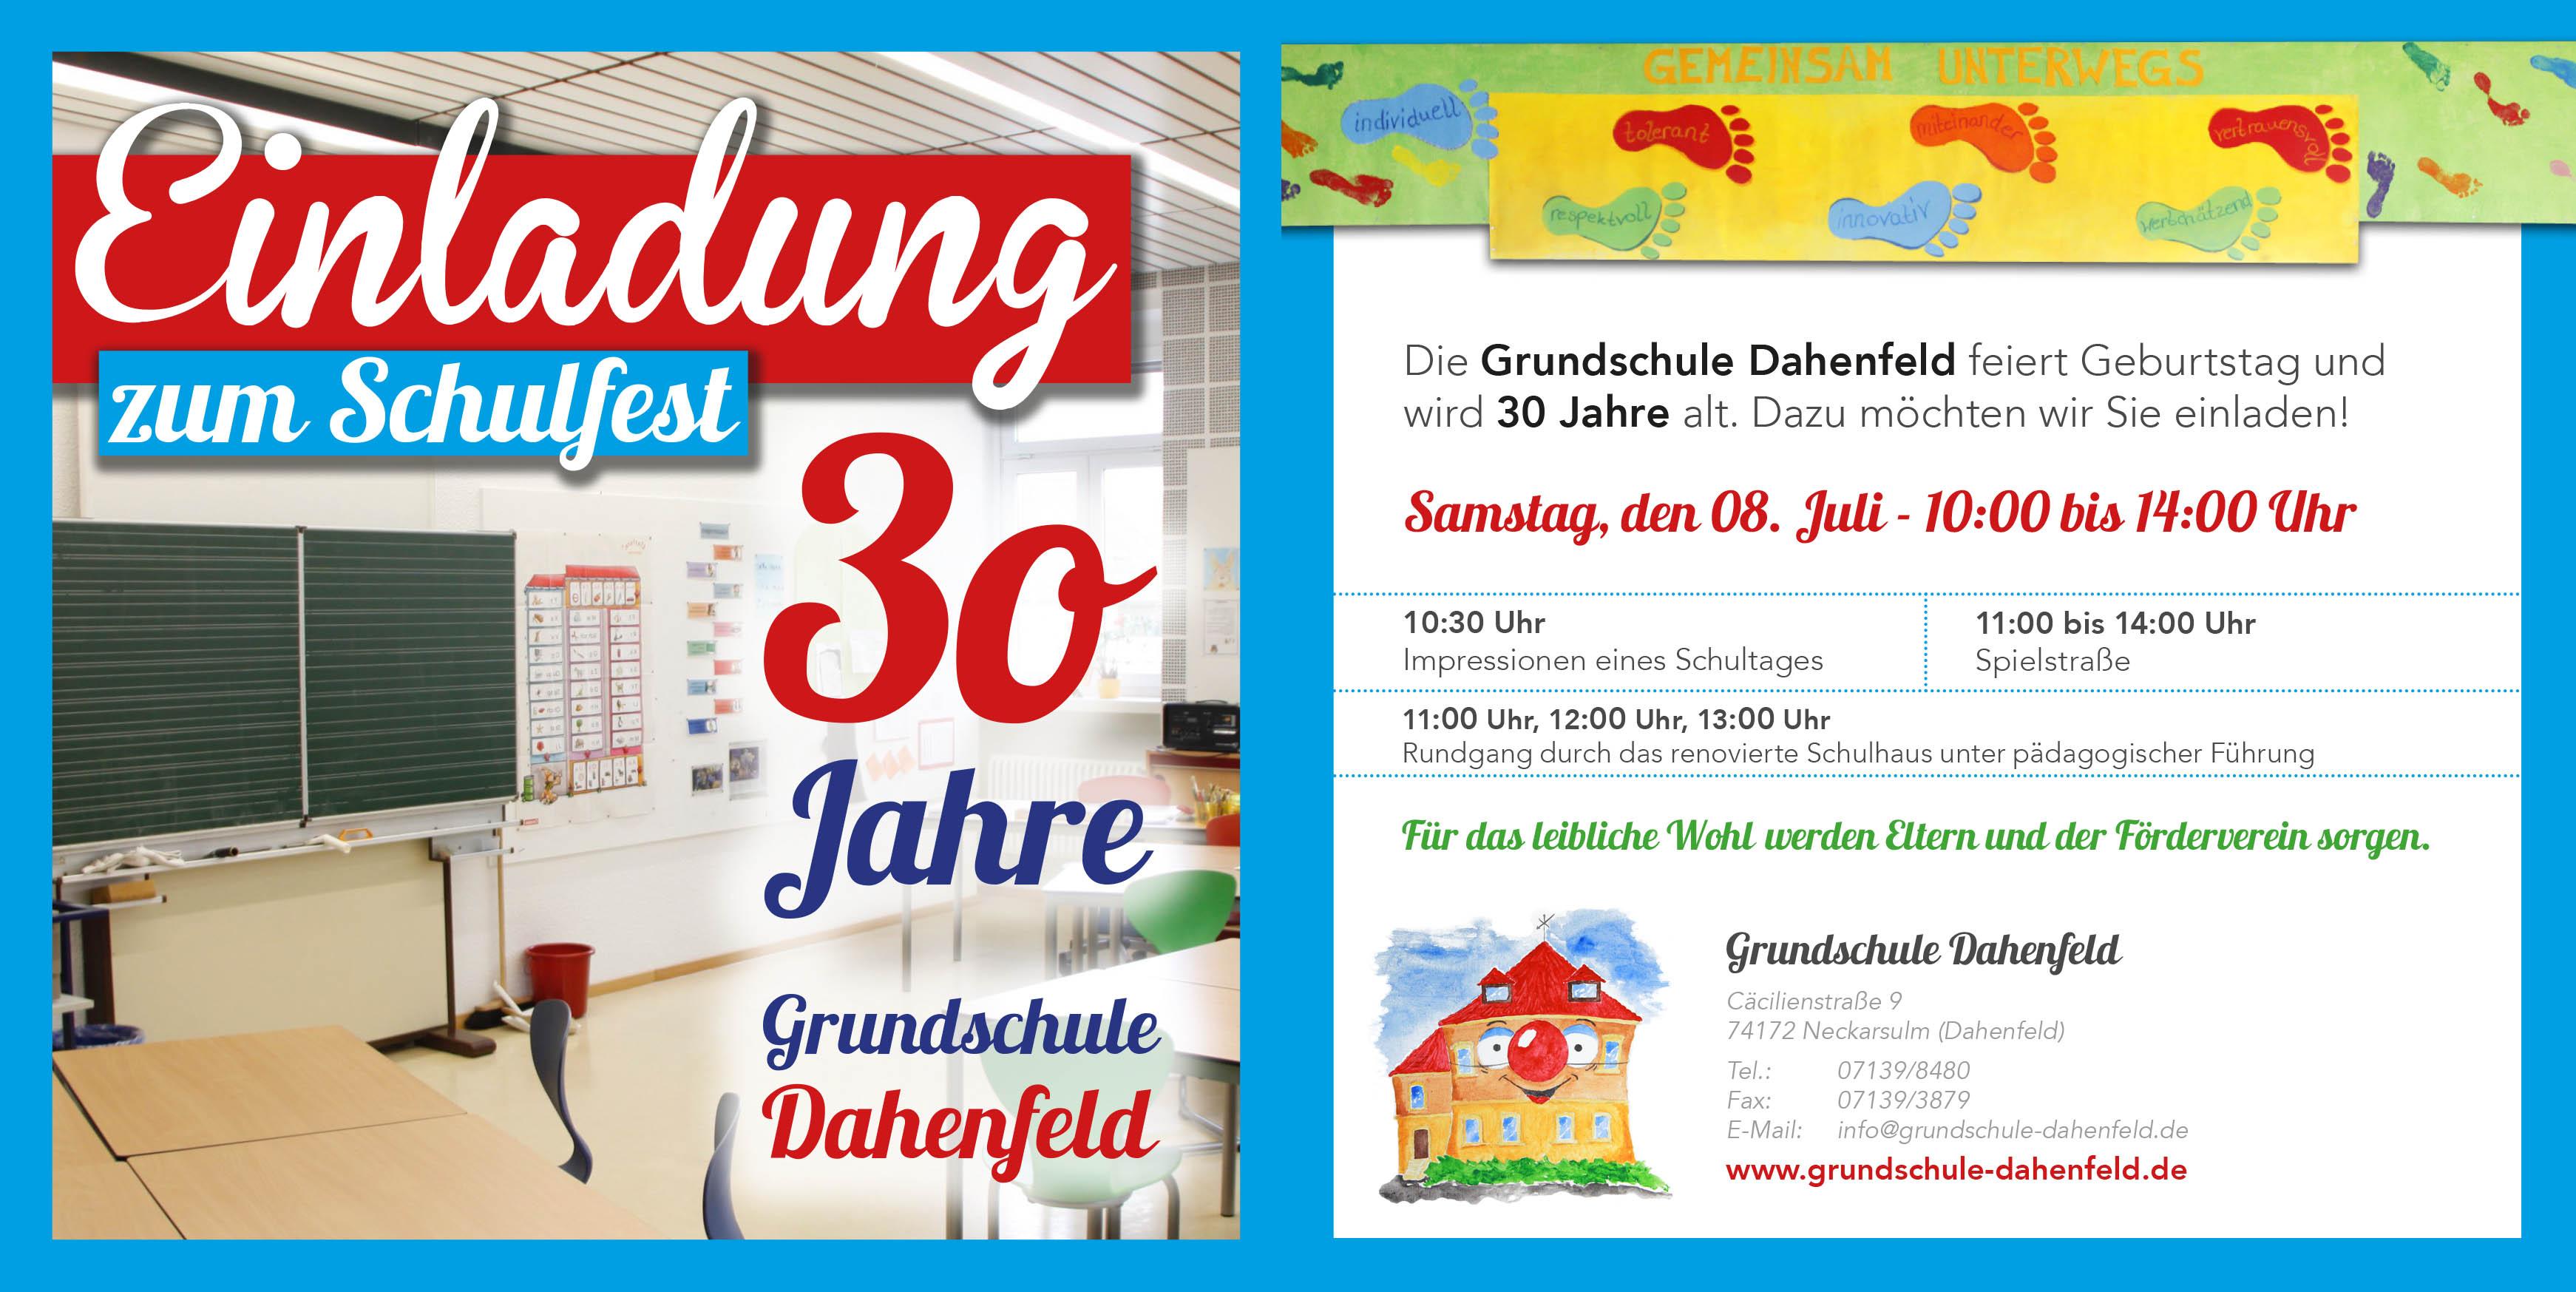 einladung zum 30 geburtstag : einladung zum 30. geburtstag selbst, Einladung